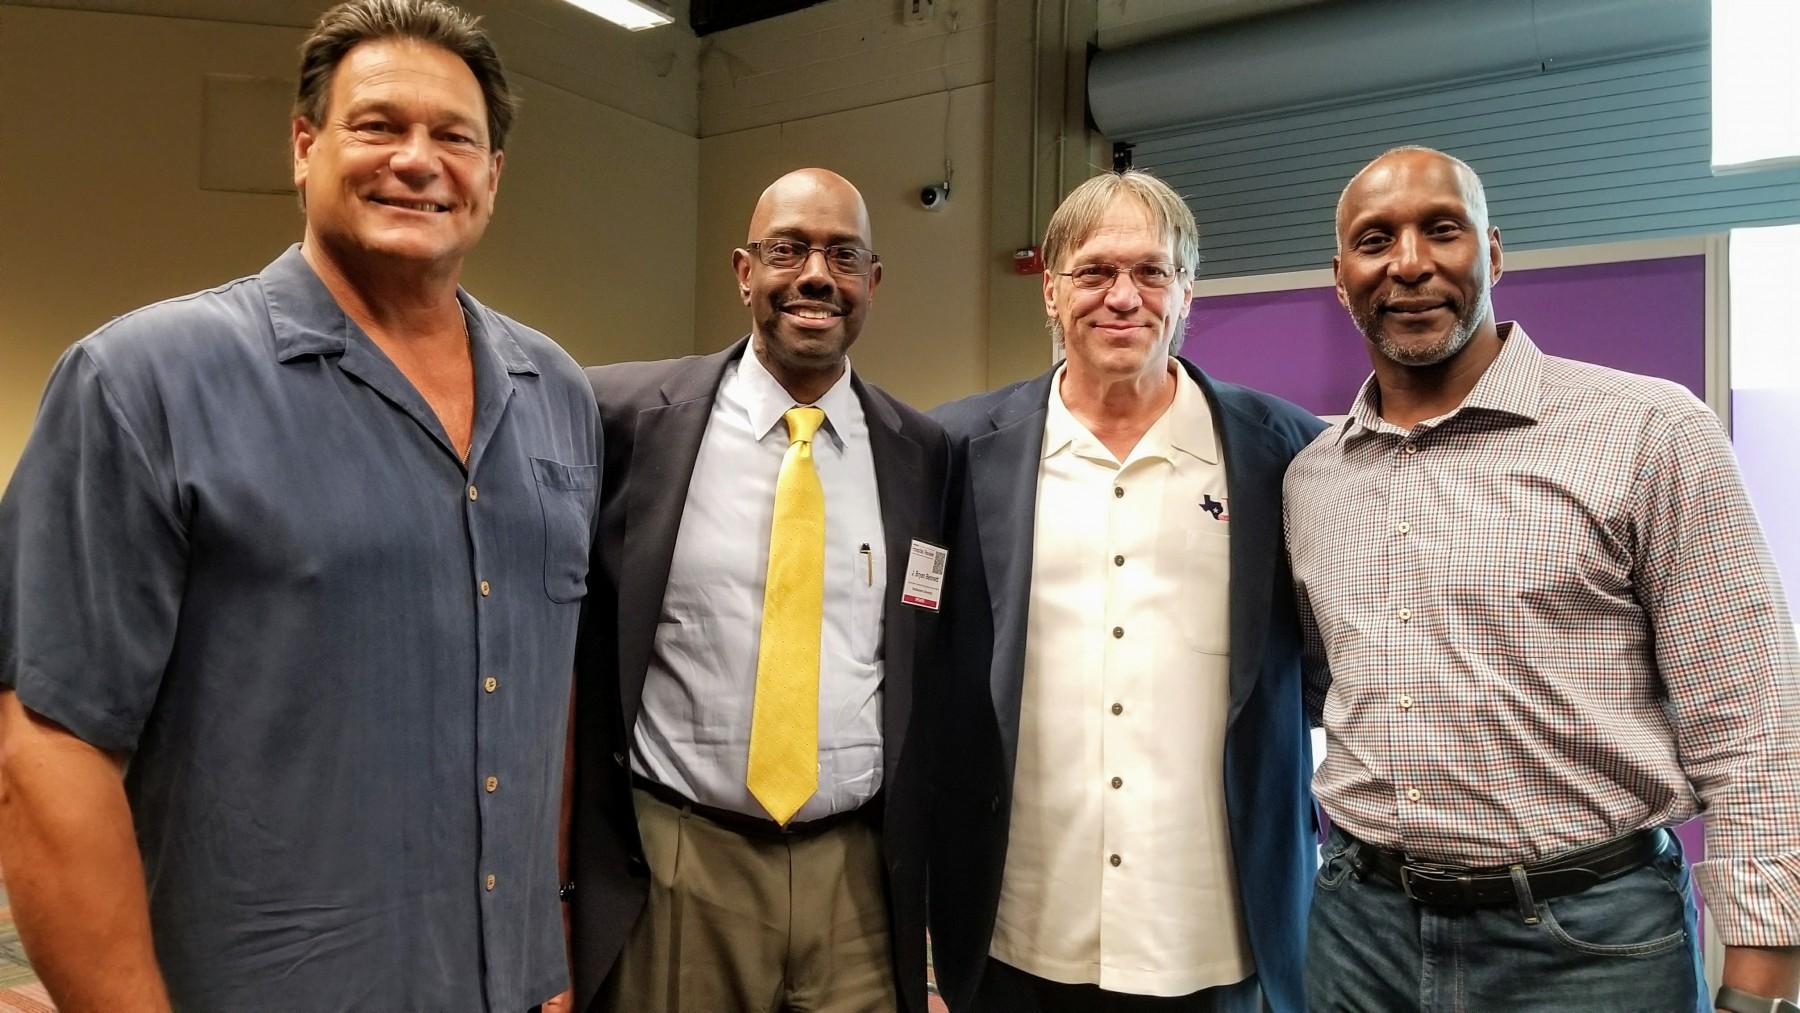 Da Bears - Dan Hampton, Steve McMichael & Otis Wilson